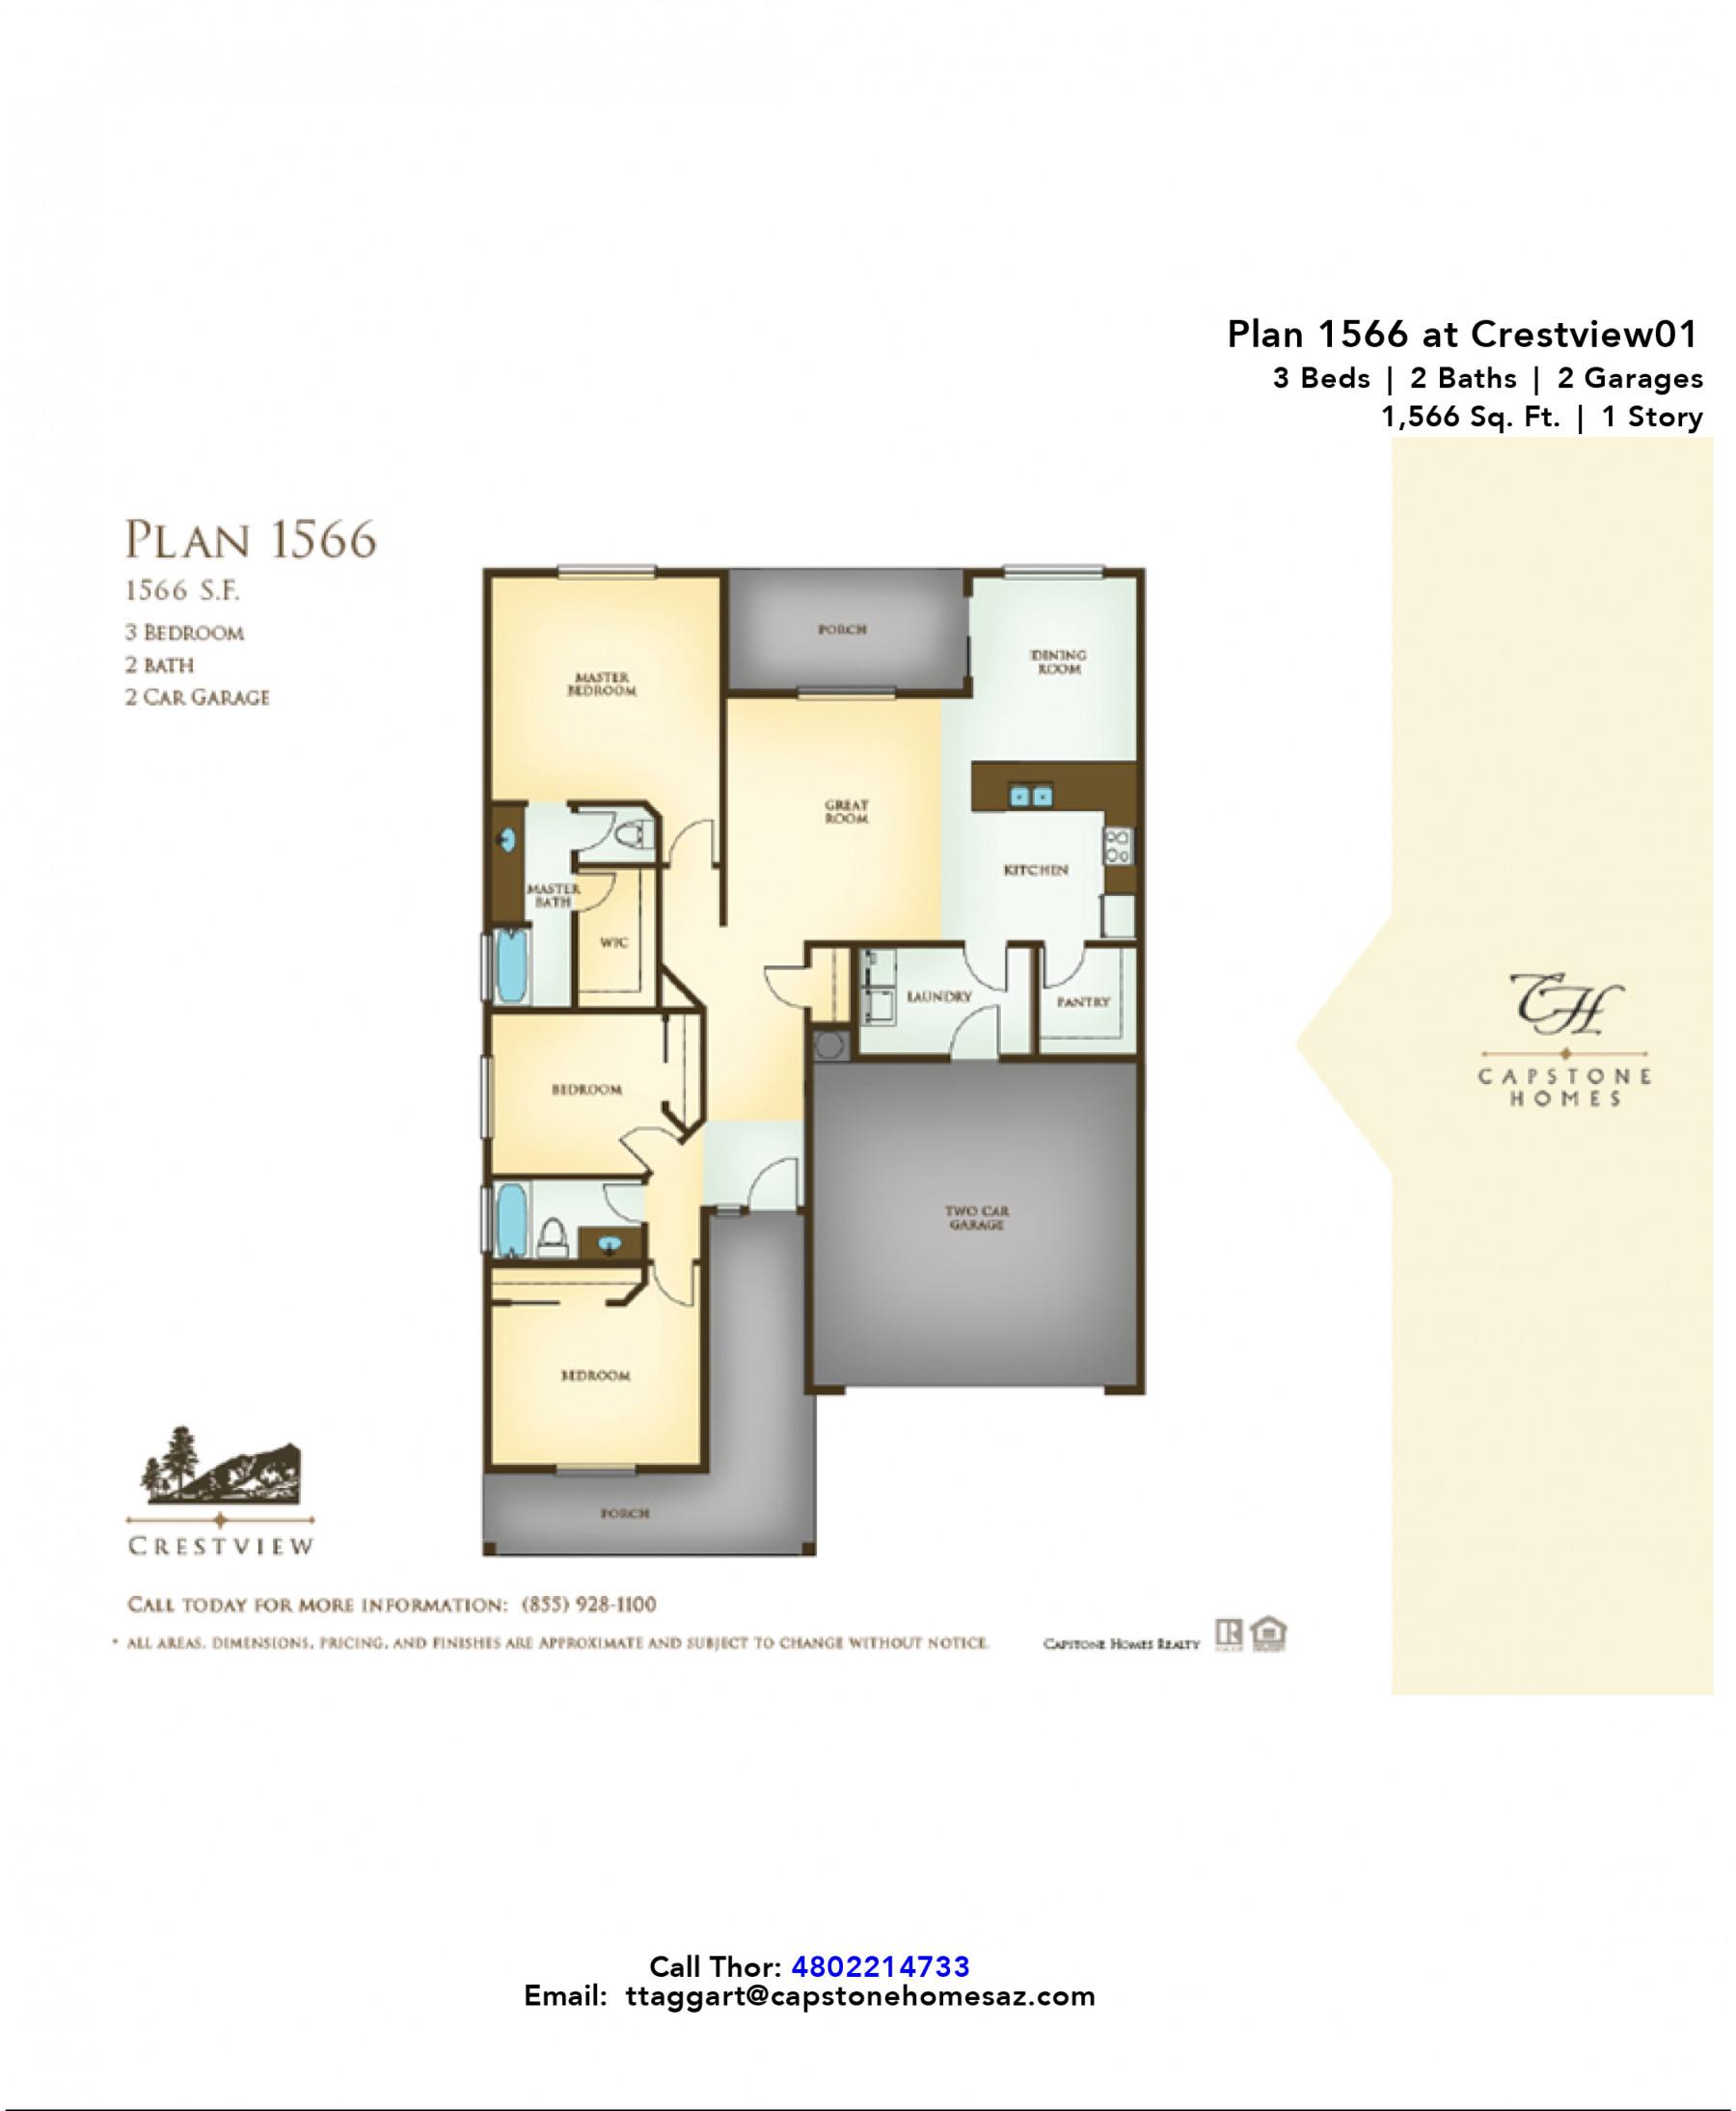 Crestview Plan 1566